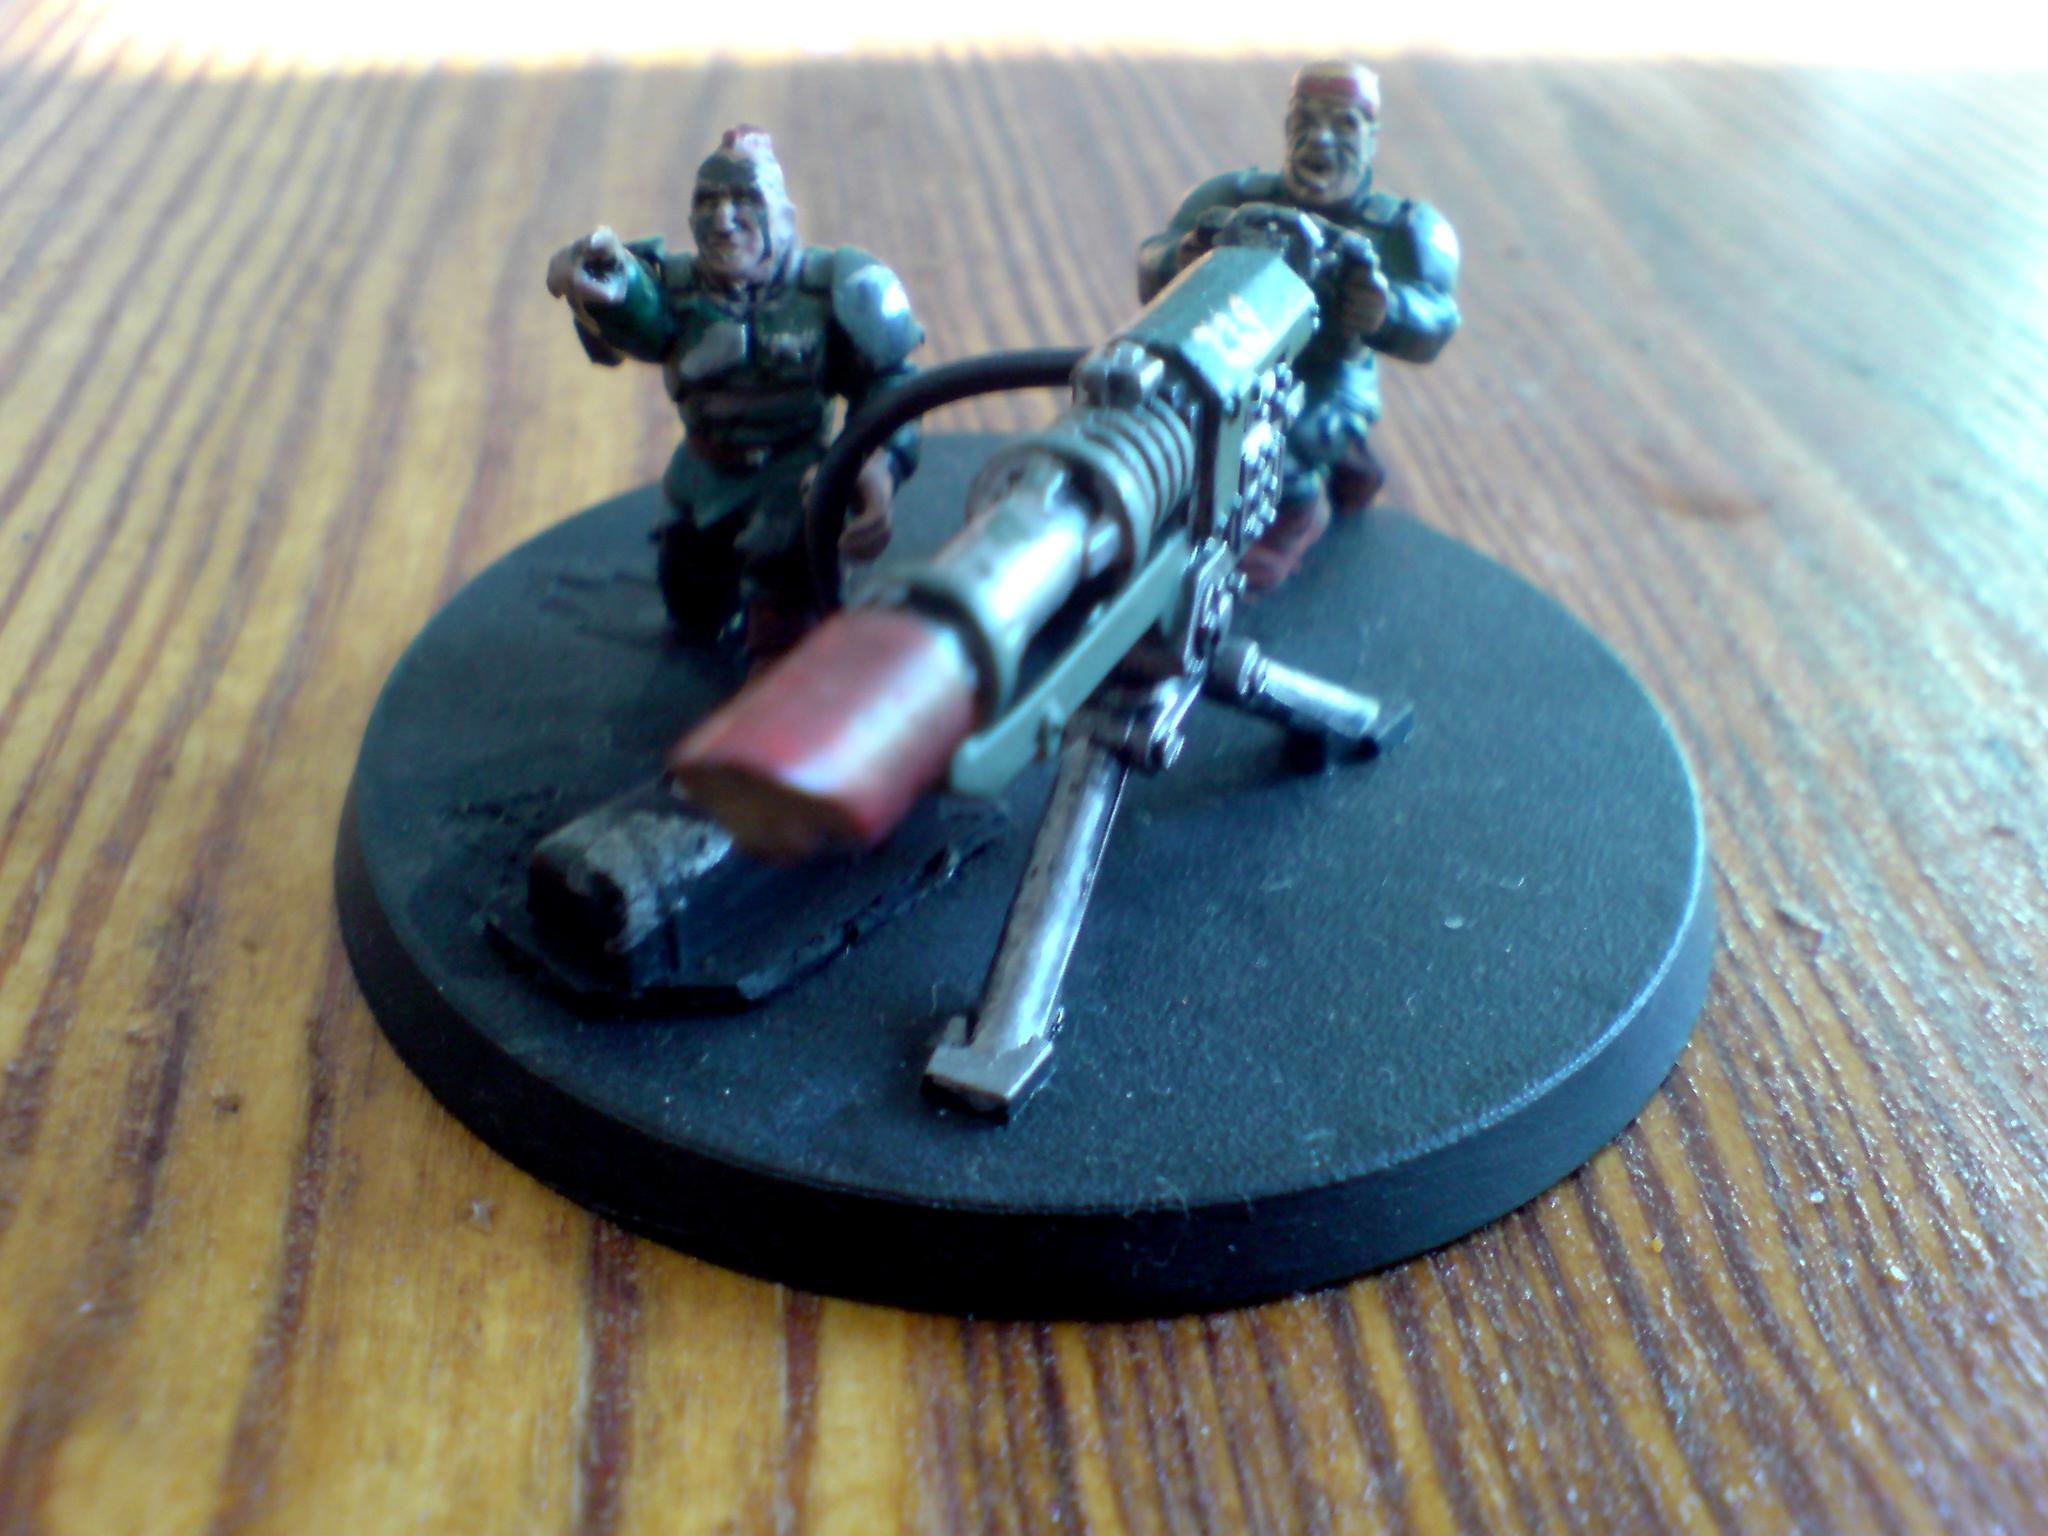 Catachan Jungle Fighters, Catachans, Guardsmen, Heavy Weapons Team, Imperial Guard, Warhammer 40,000